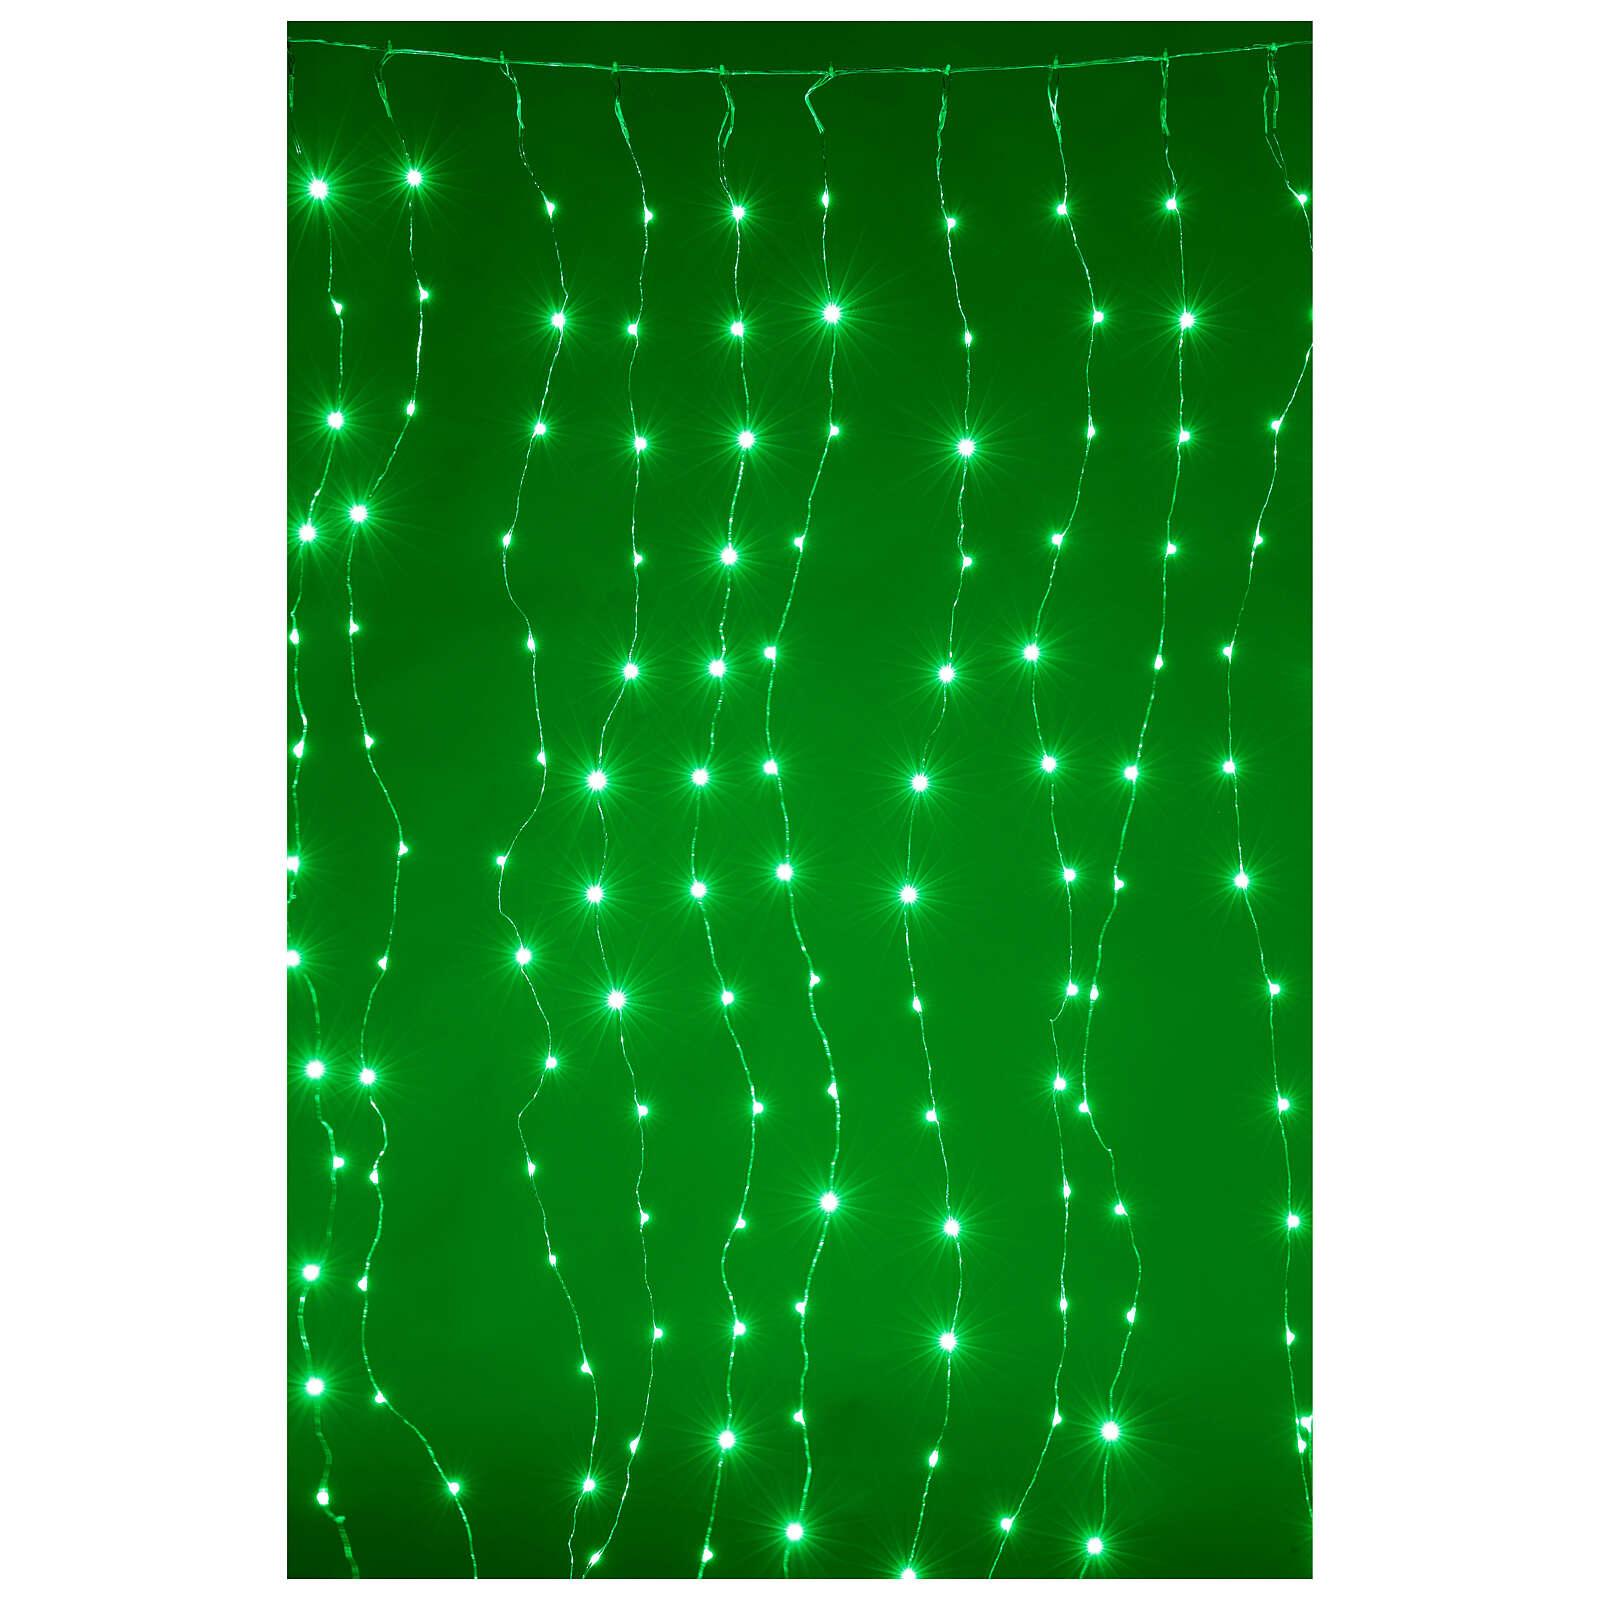 Cortina luz navideña 240 super nanoled multicolores con control remoto 3